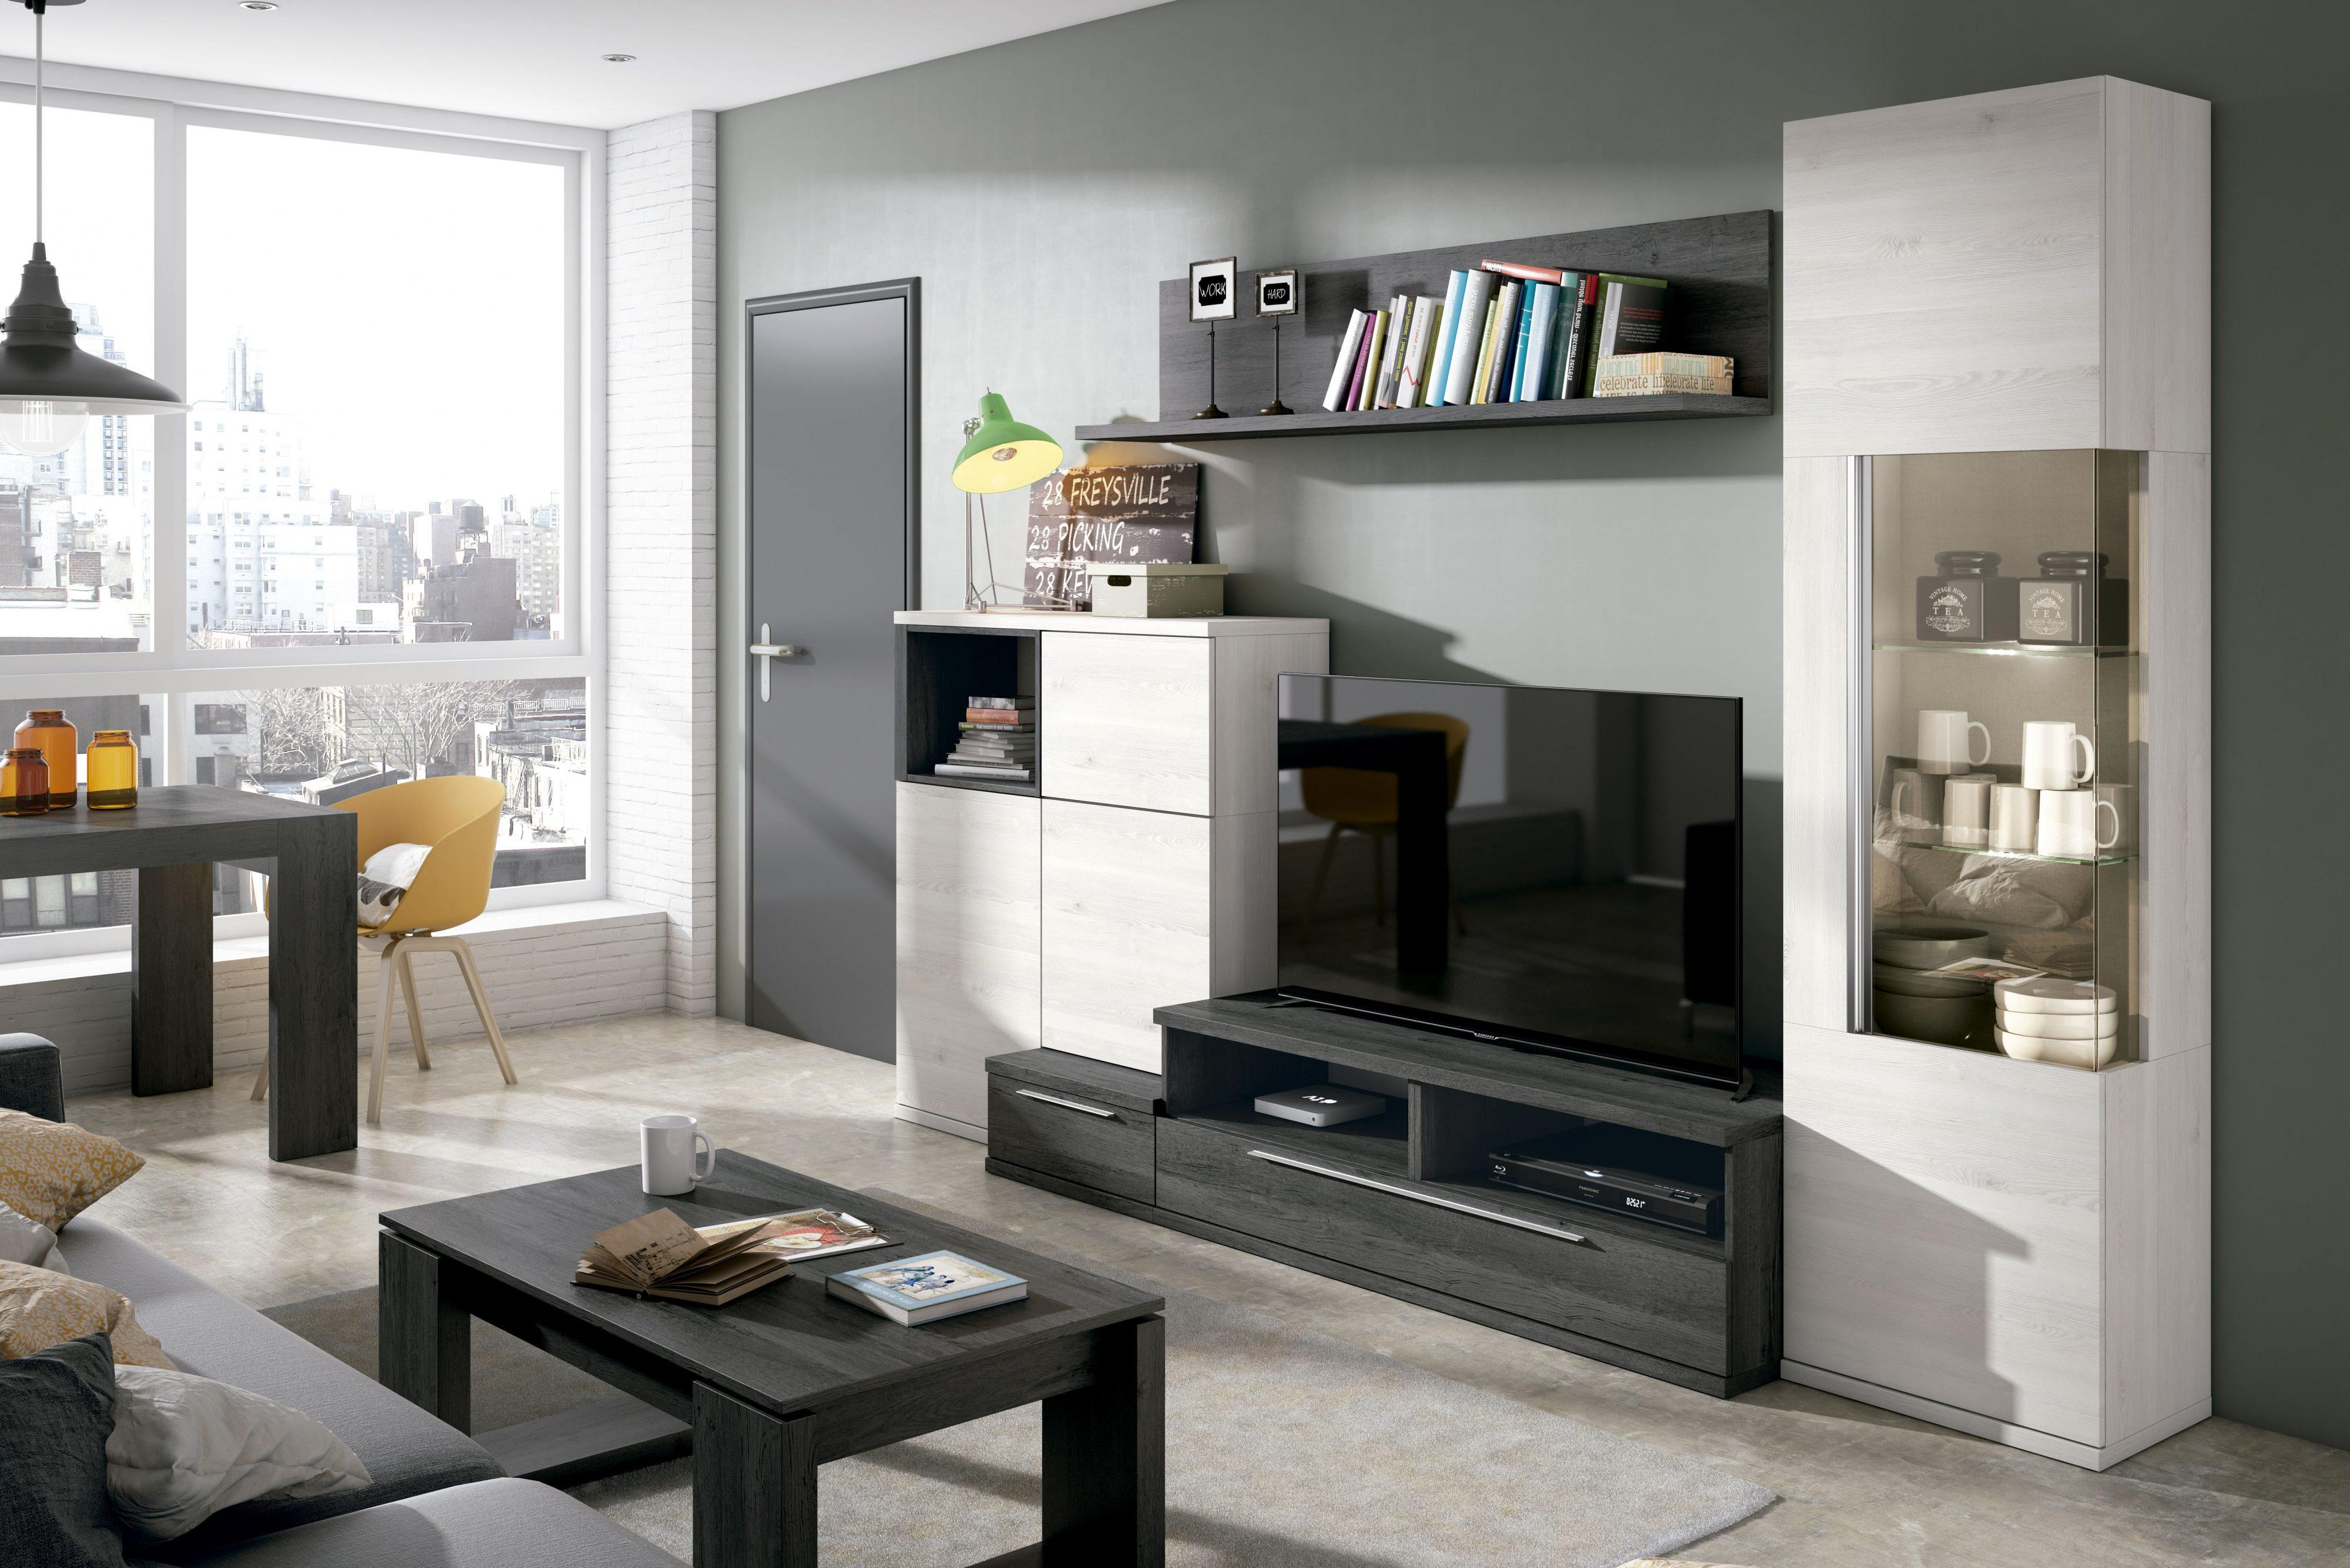 Composición modular de 302x205 con variantes de color, crea un ambiente diferente con posibilidades casi ilimitadas.